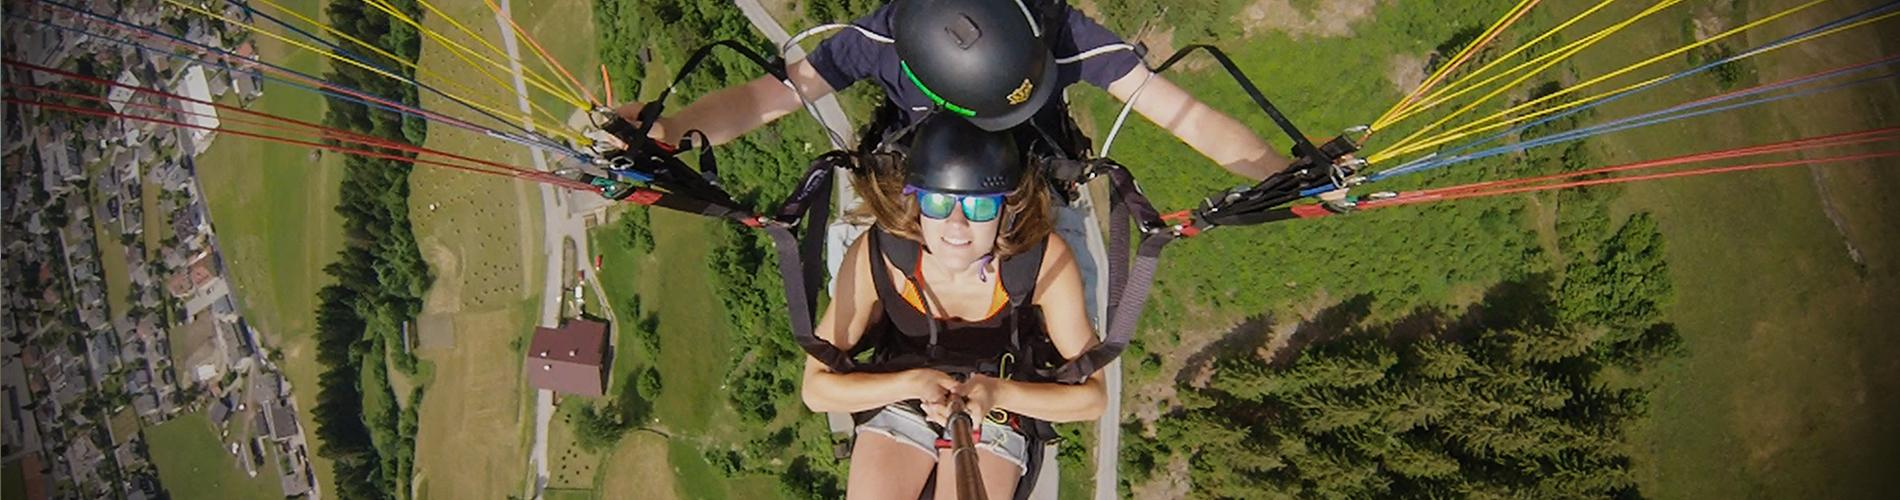 slider-1900x500_tandem-paragliding-austria_007